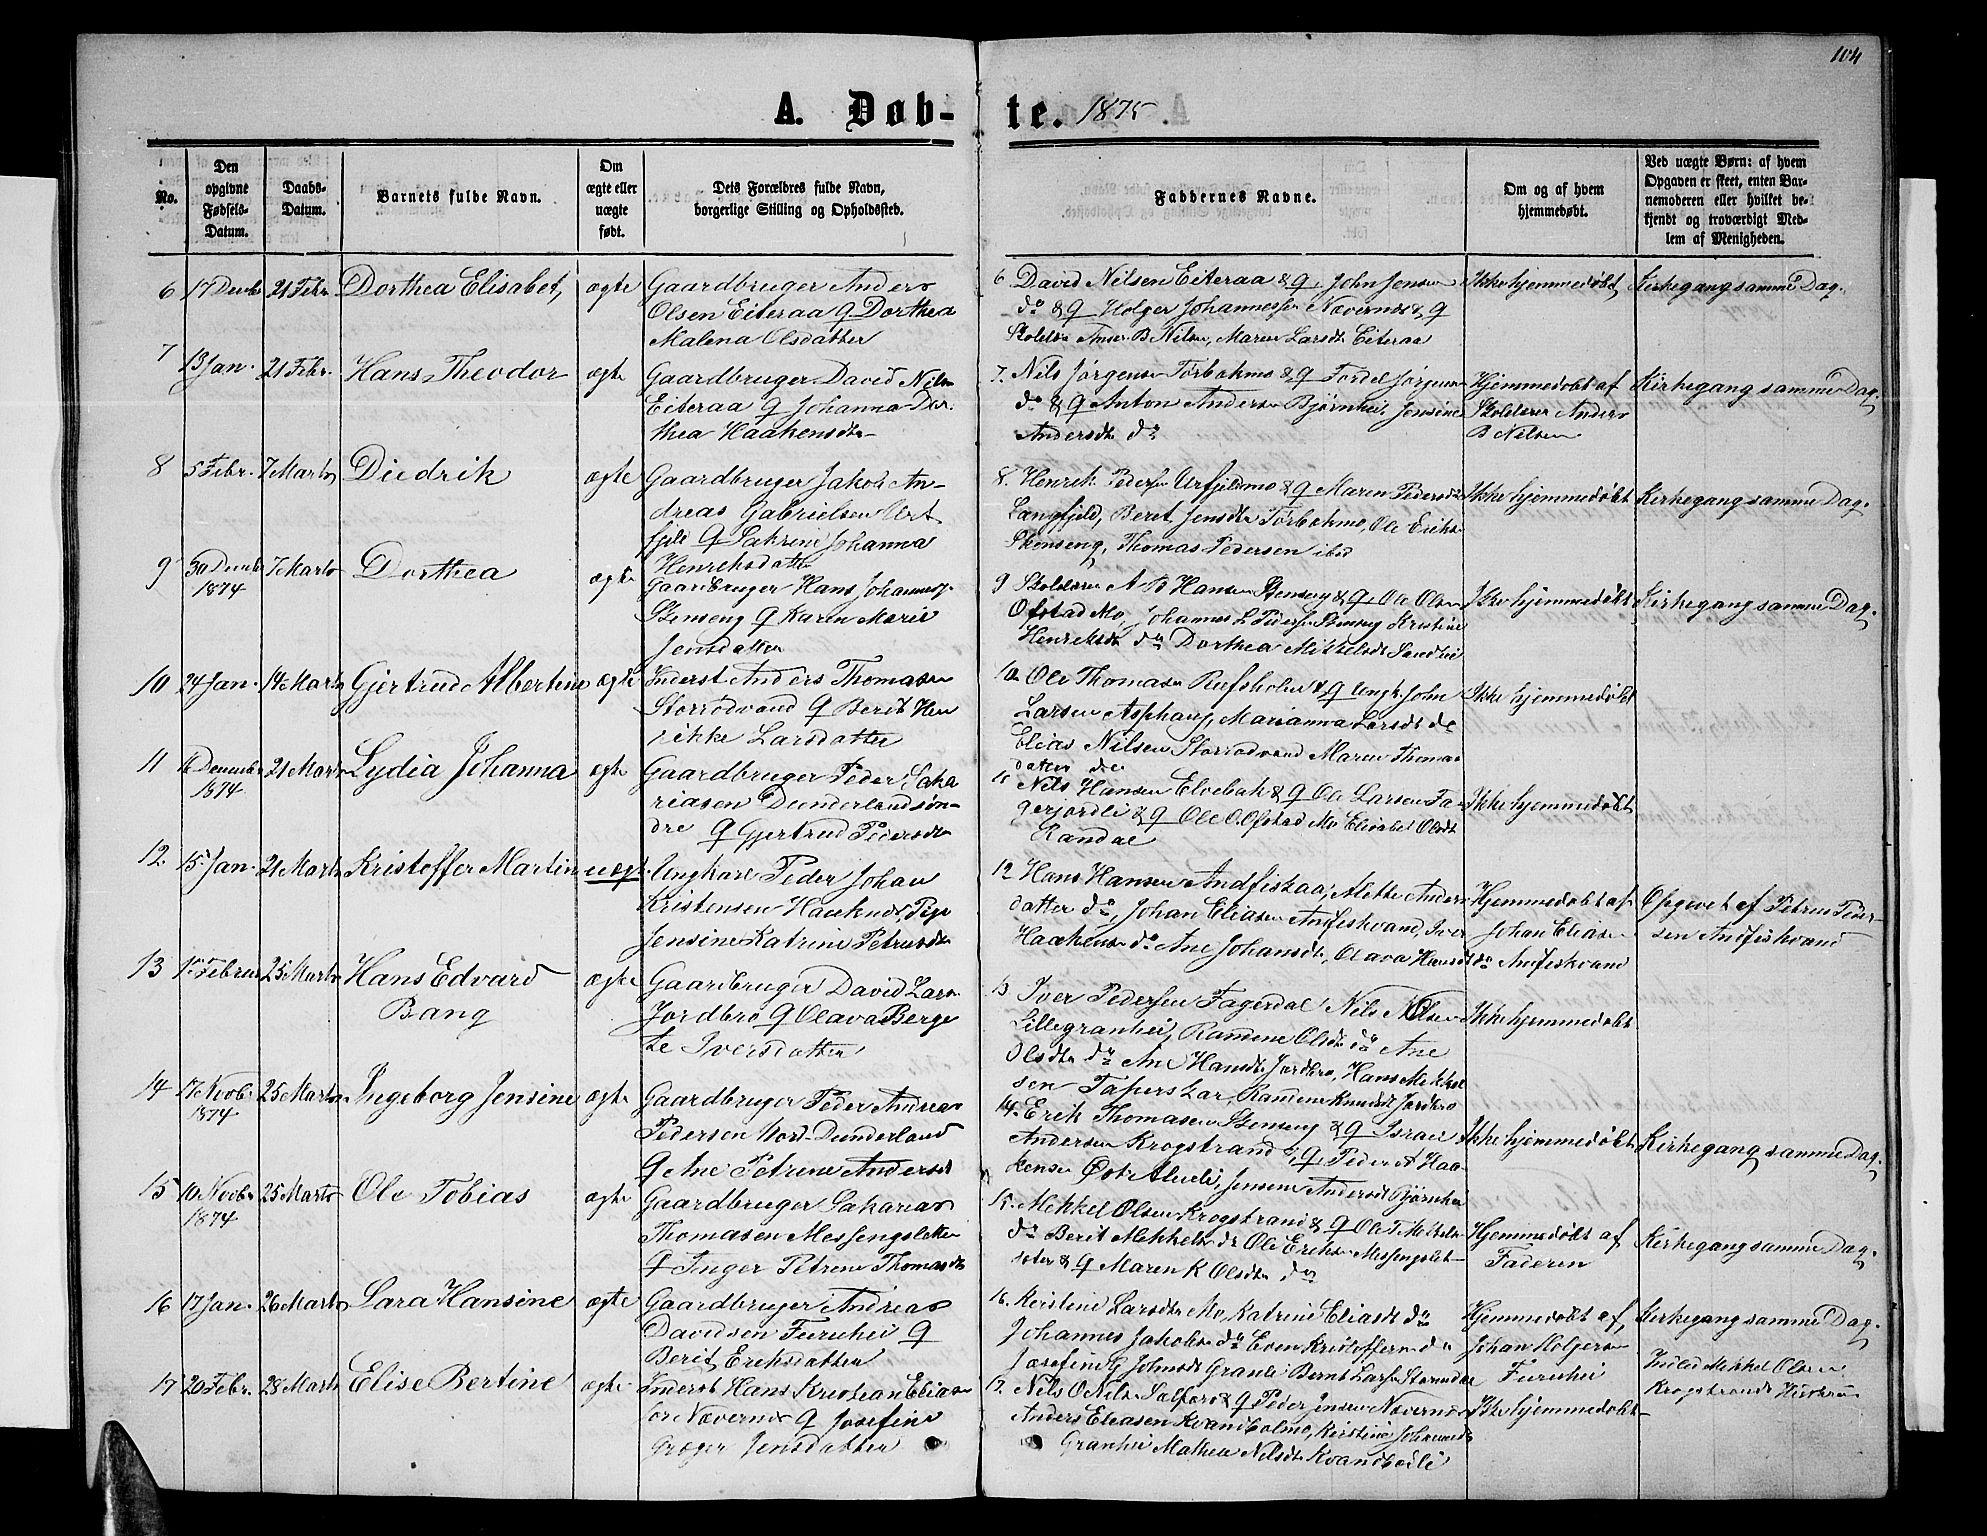 SAT, Ministerialprotokoller, klokkerbøker og fødselsregistre - Nordland, 827/L0415: Klokkerbok nr. 827C04, 1864-1886, s. 104